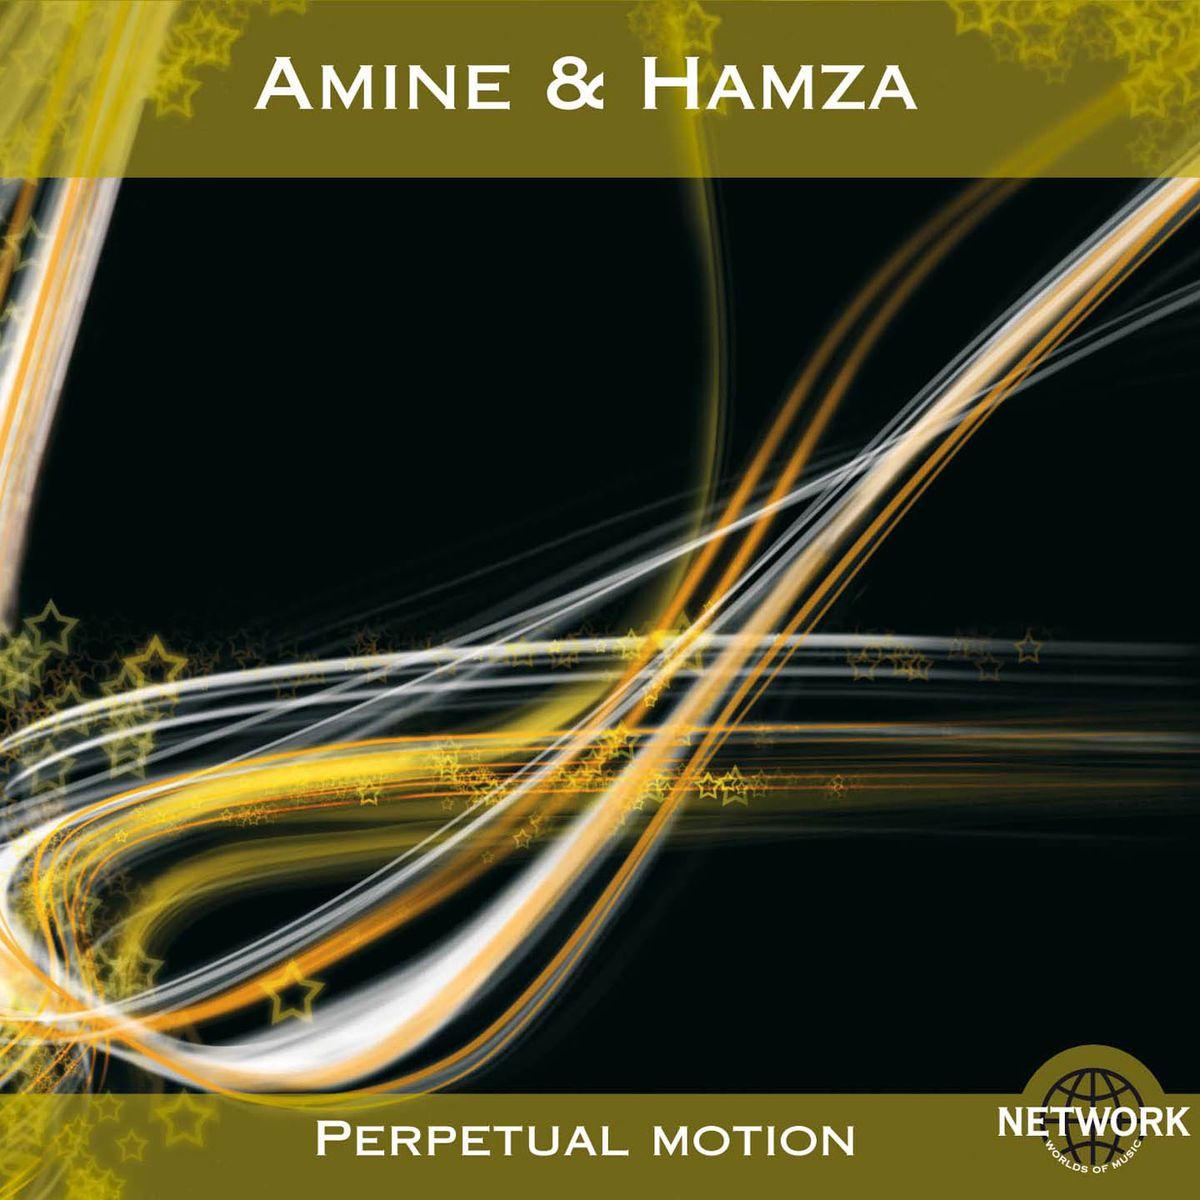 купить Amine,Hamza Amine & Hamza. Perpetual Motion по цене 1185 рублей